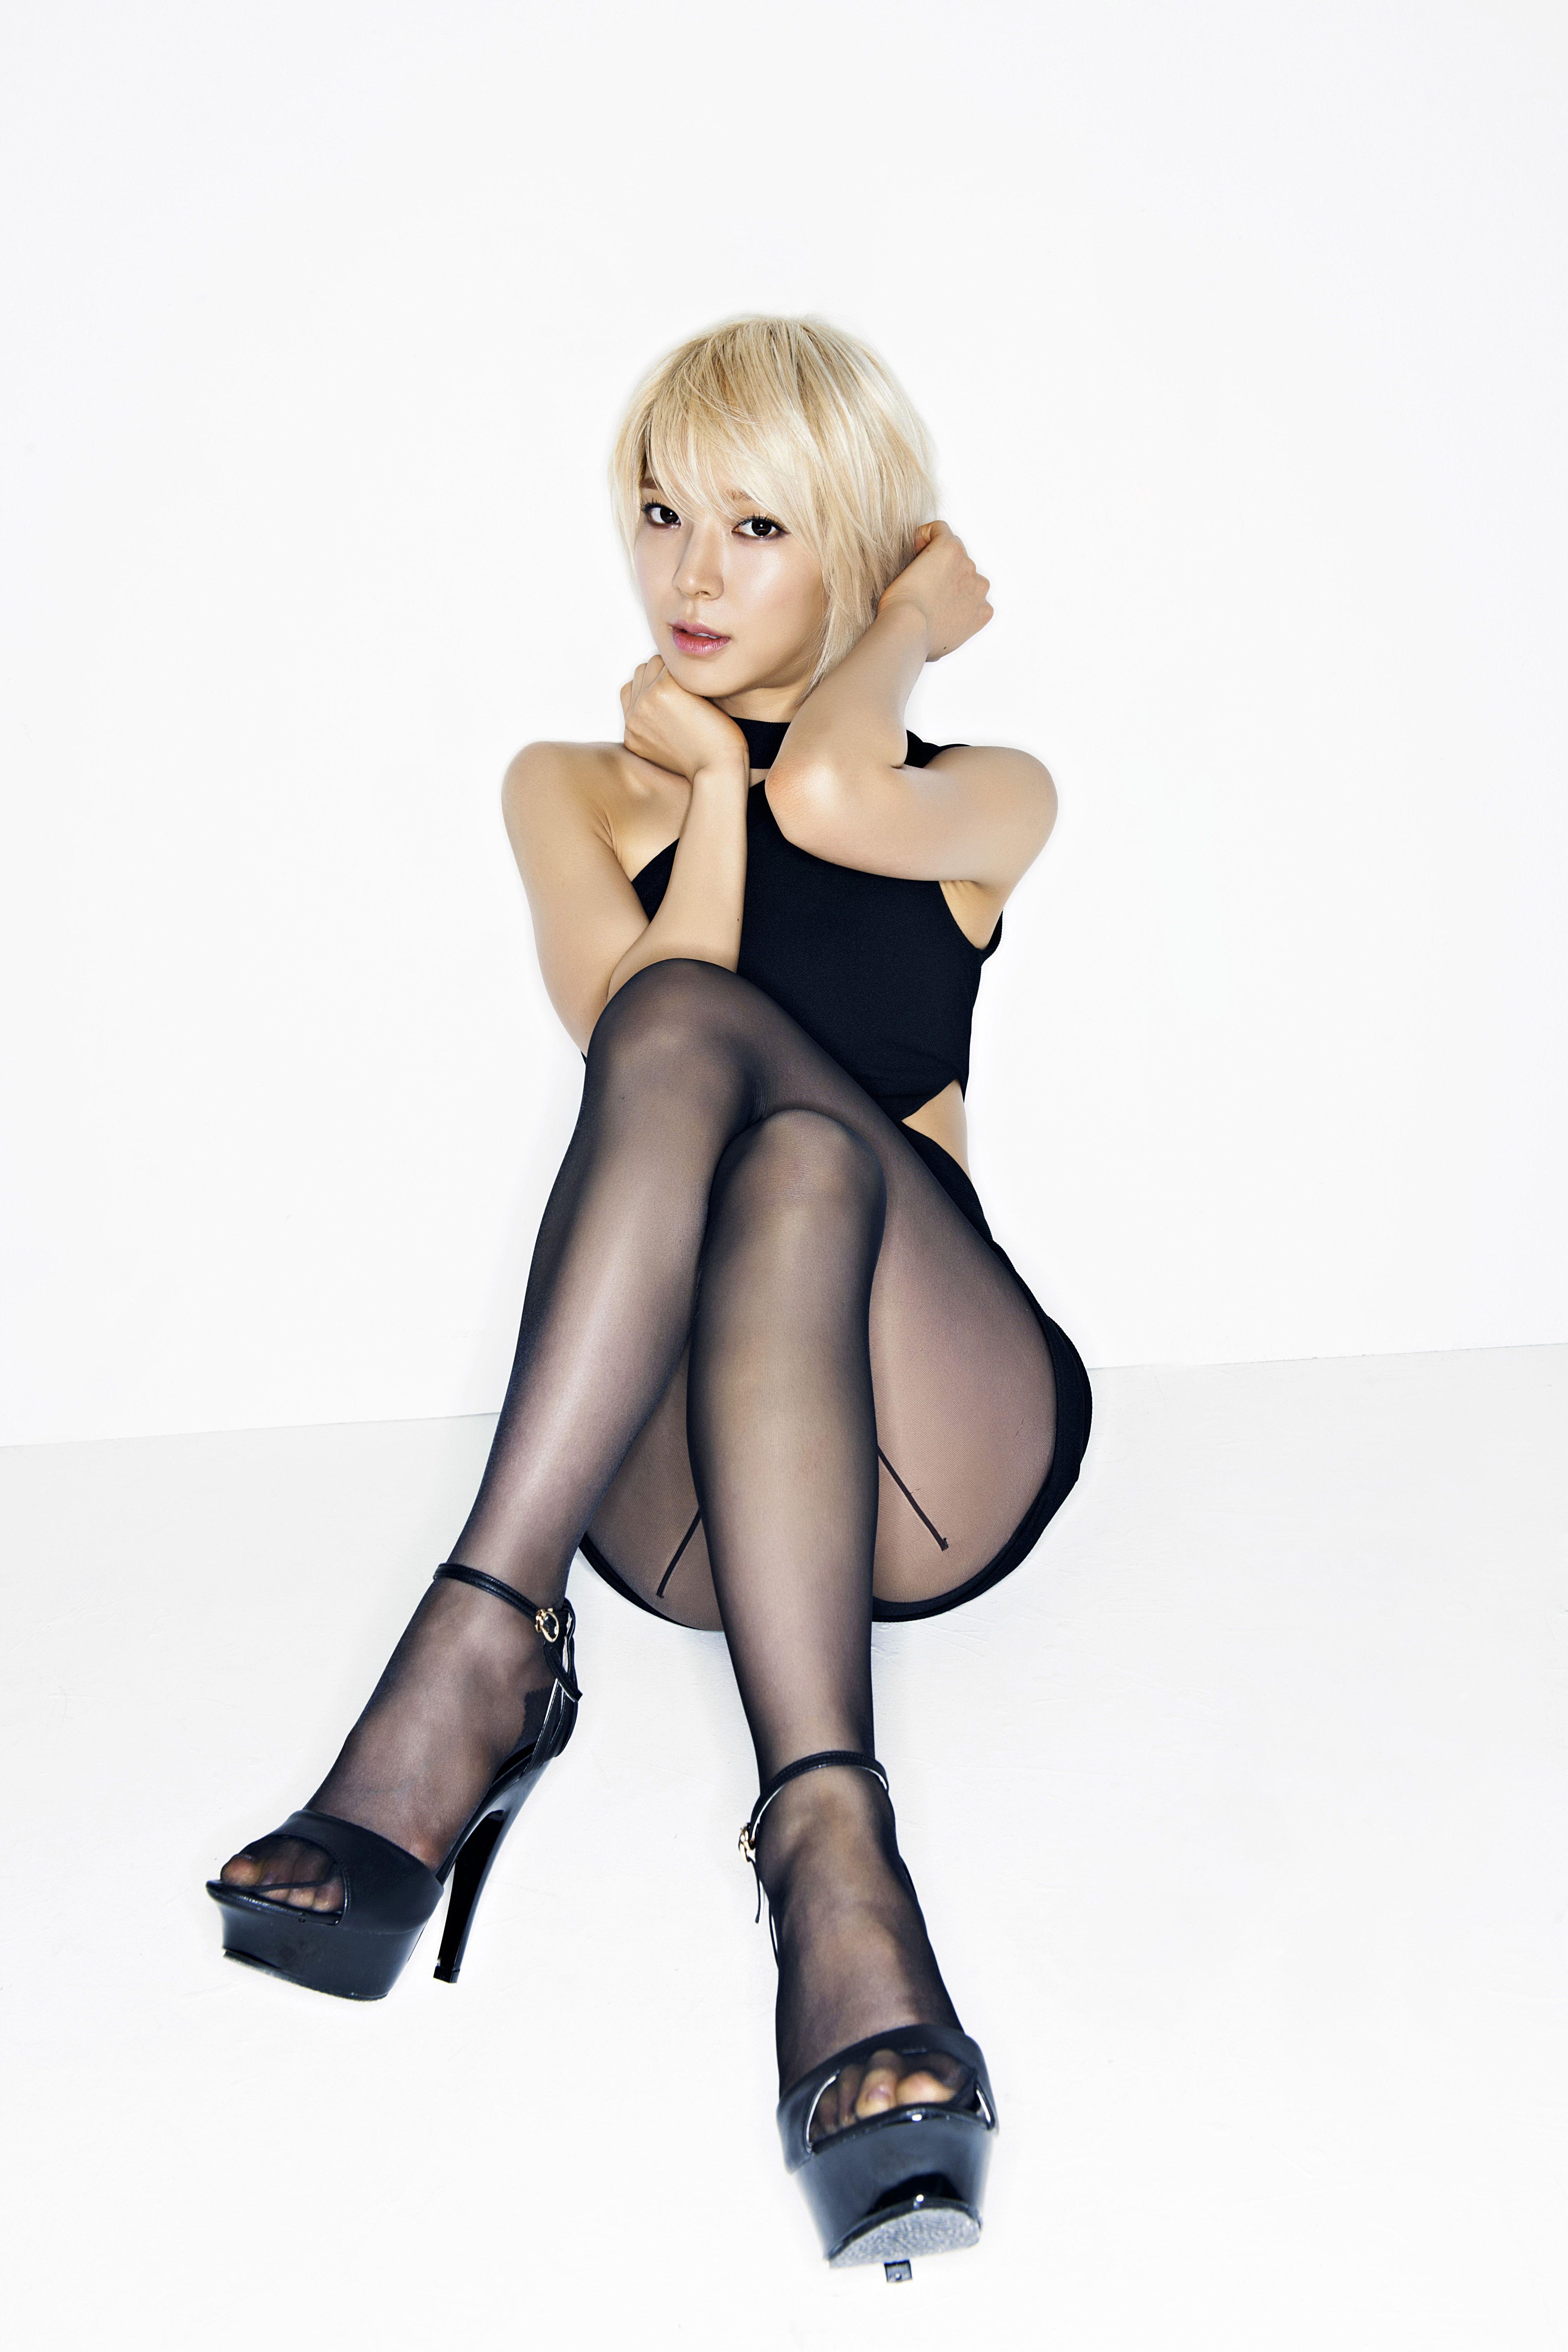 Stockings hd pics